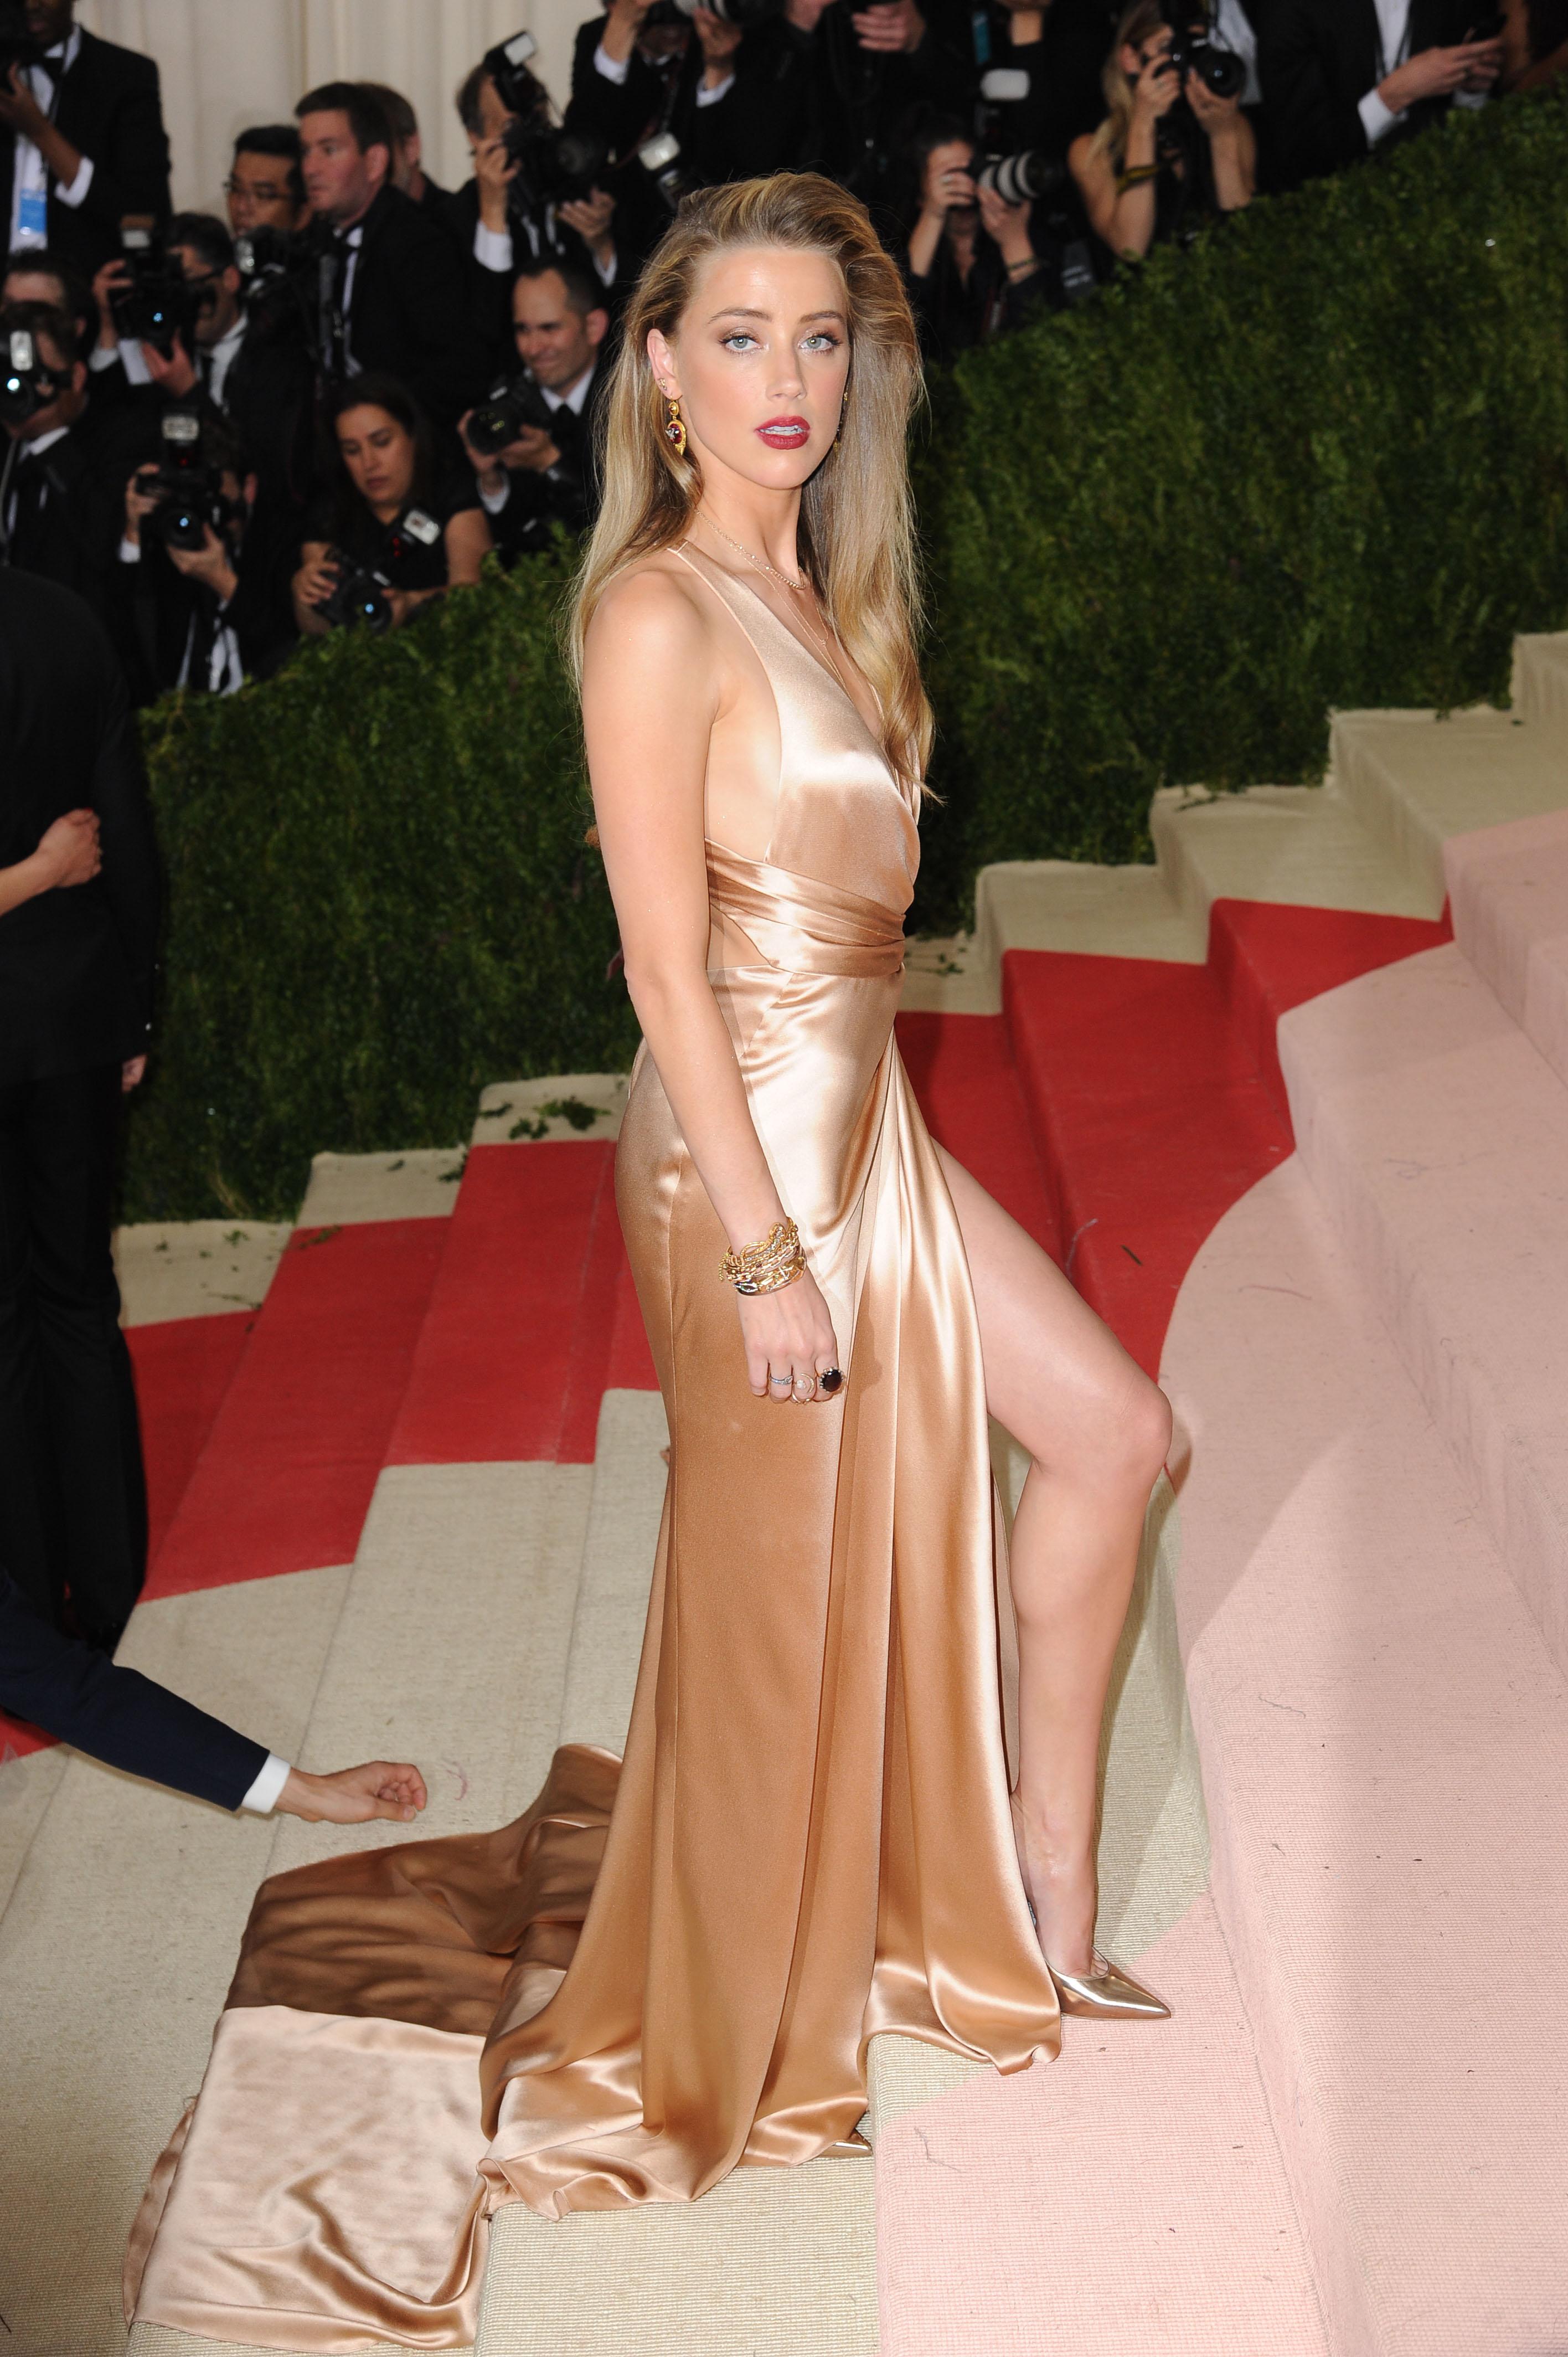 Amber Heard 2016 Costume Institute Gala 4 - Satiny Amber Heard